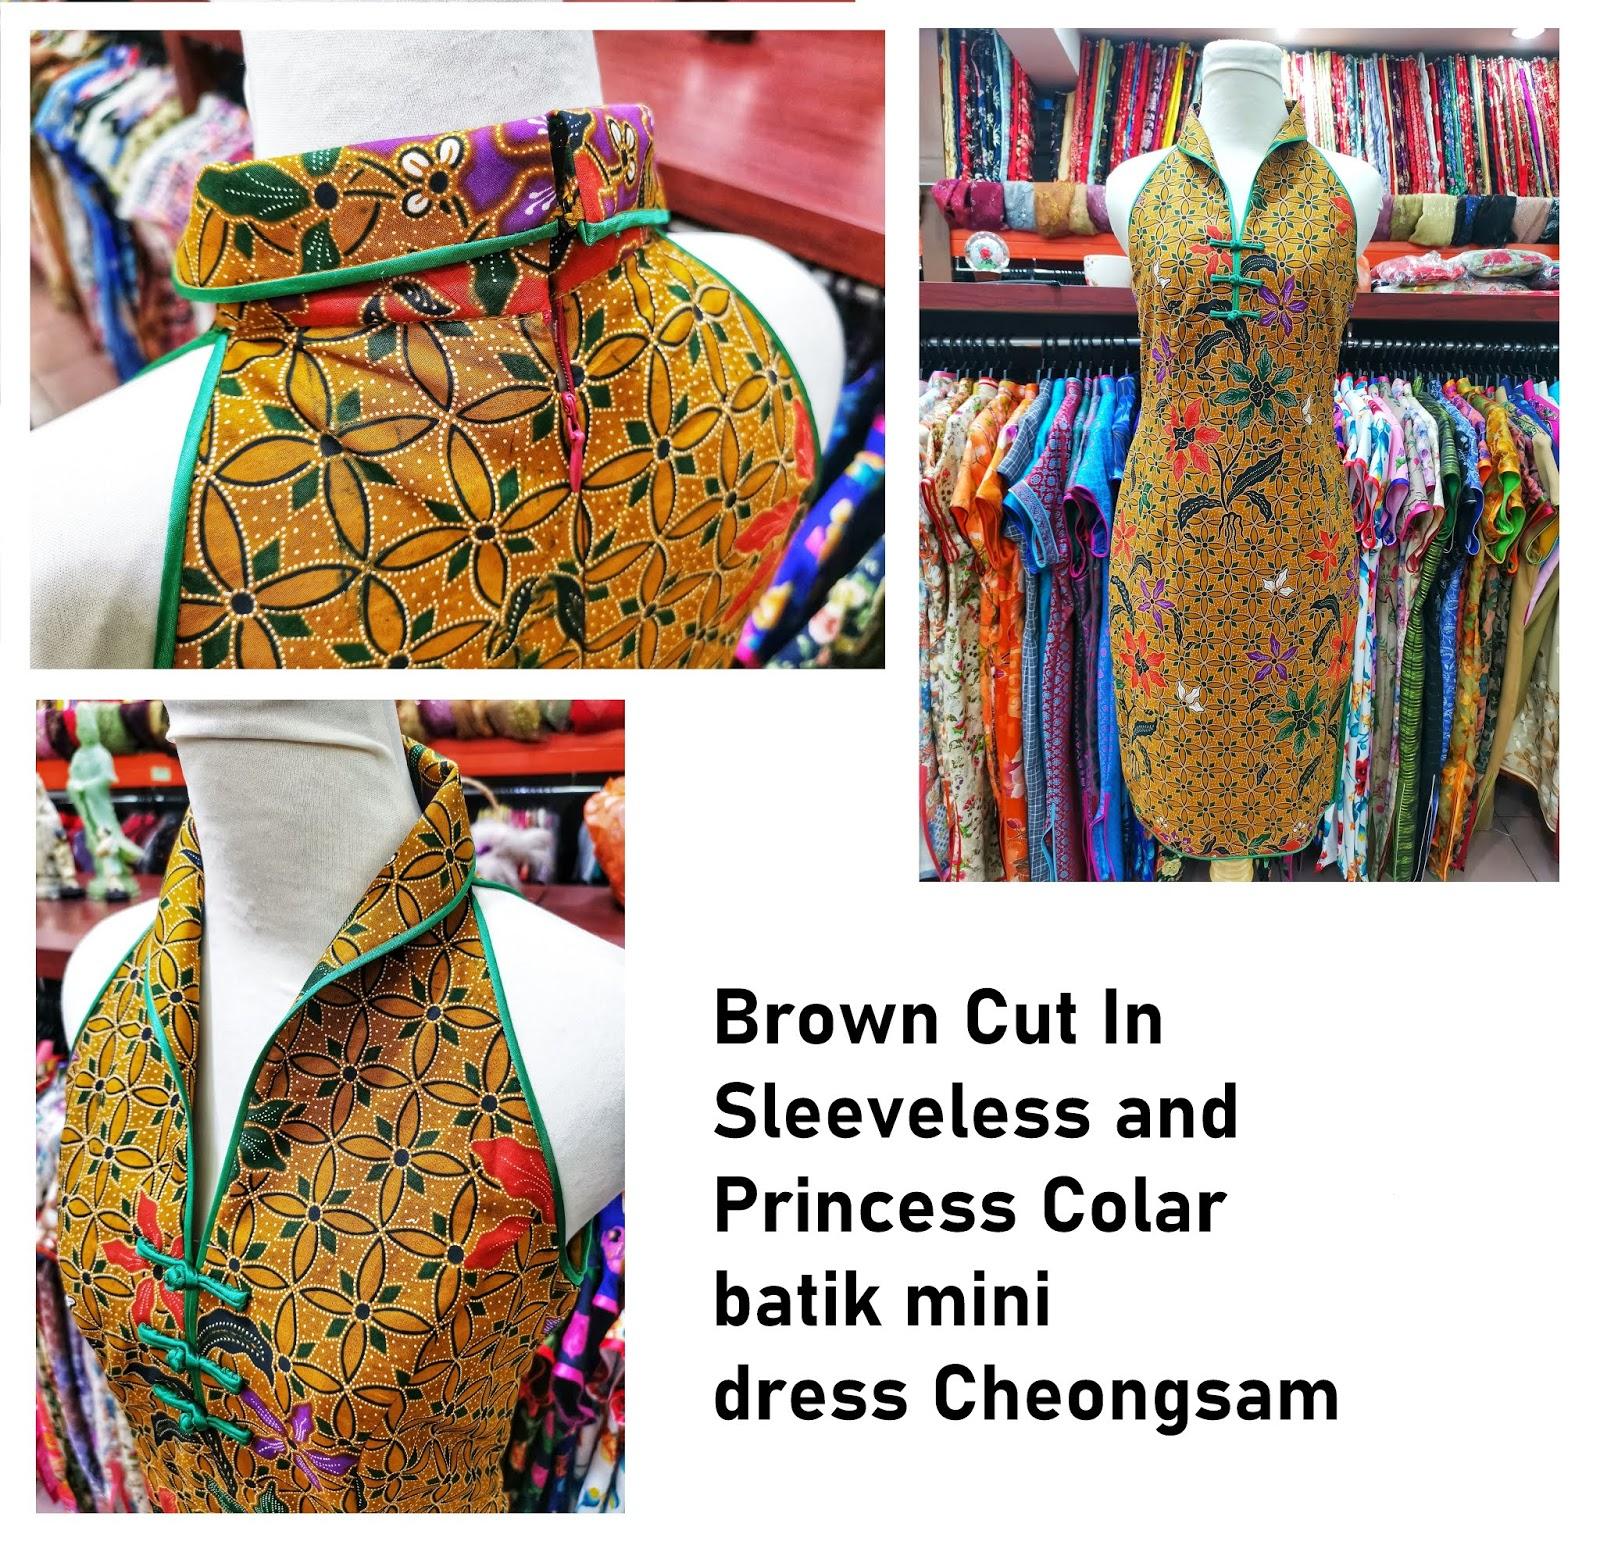 Batik Series By Emerald Brilliant Cheongsam Boutique 鑫碧旗袍